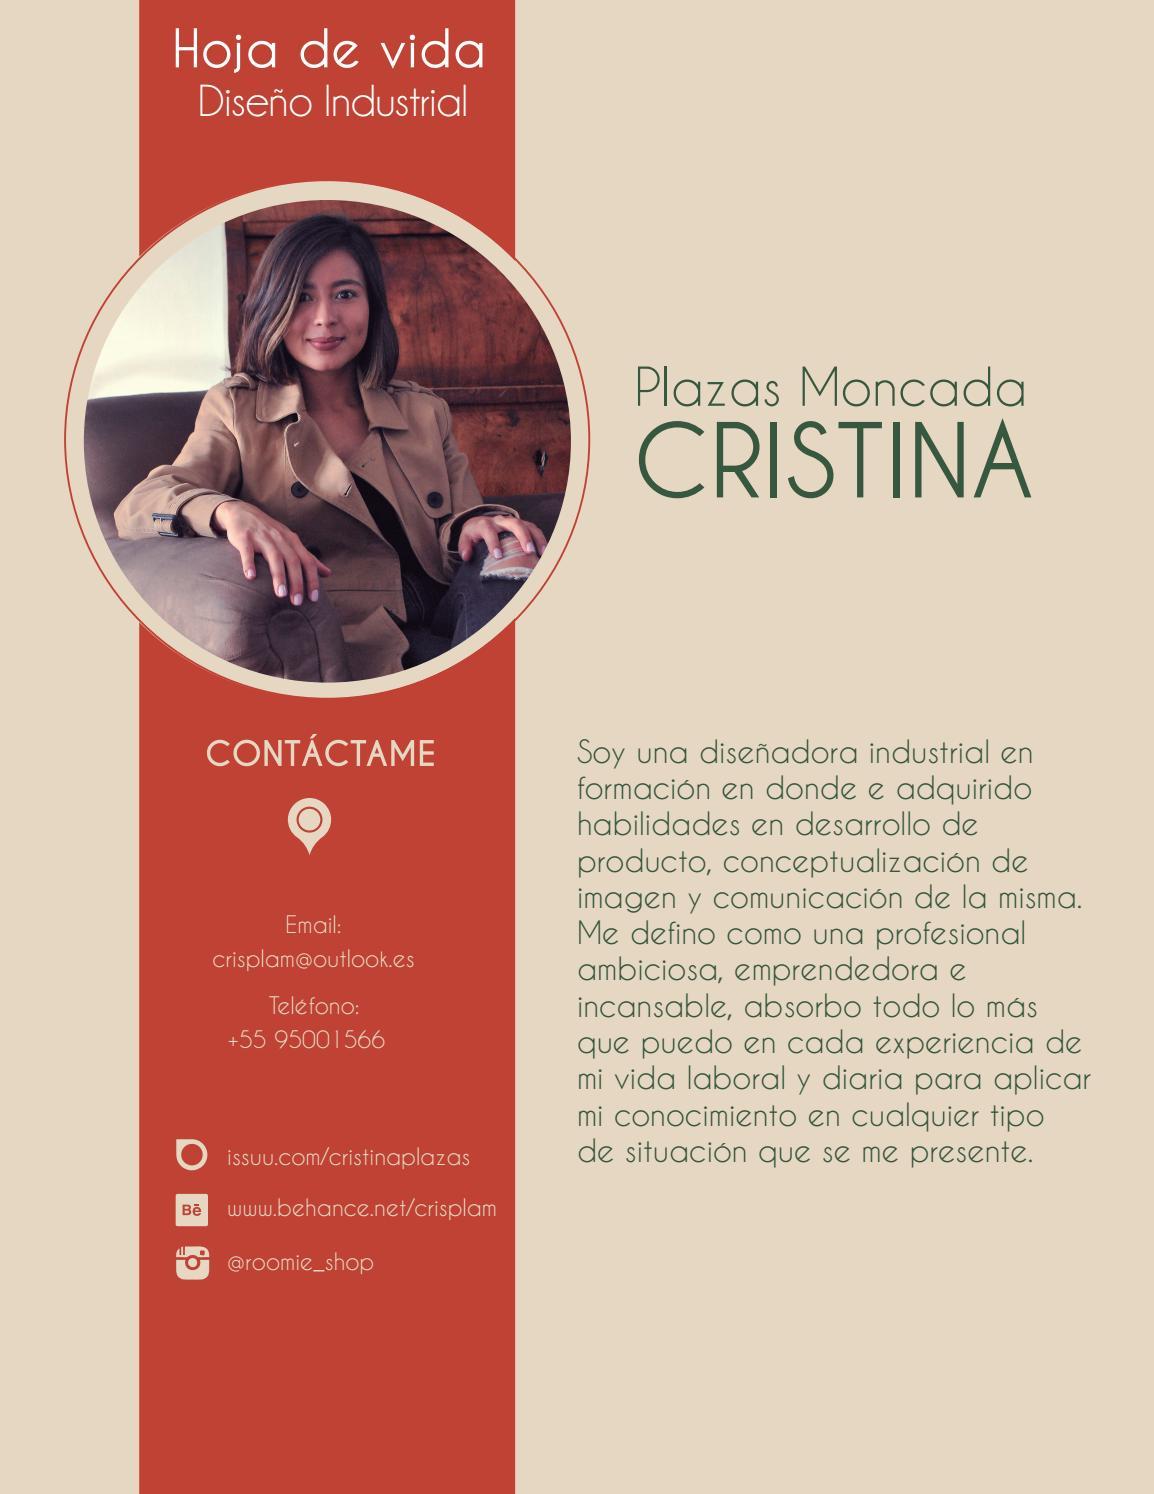 Hoja de vida 2016 - 2017 by Cristina Plazas - issuu